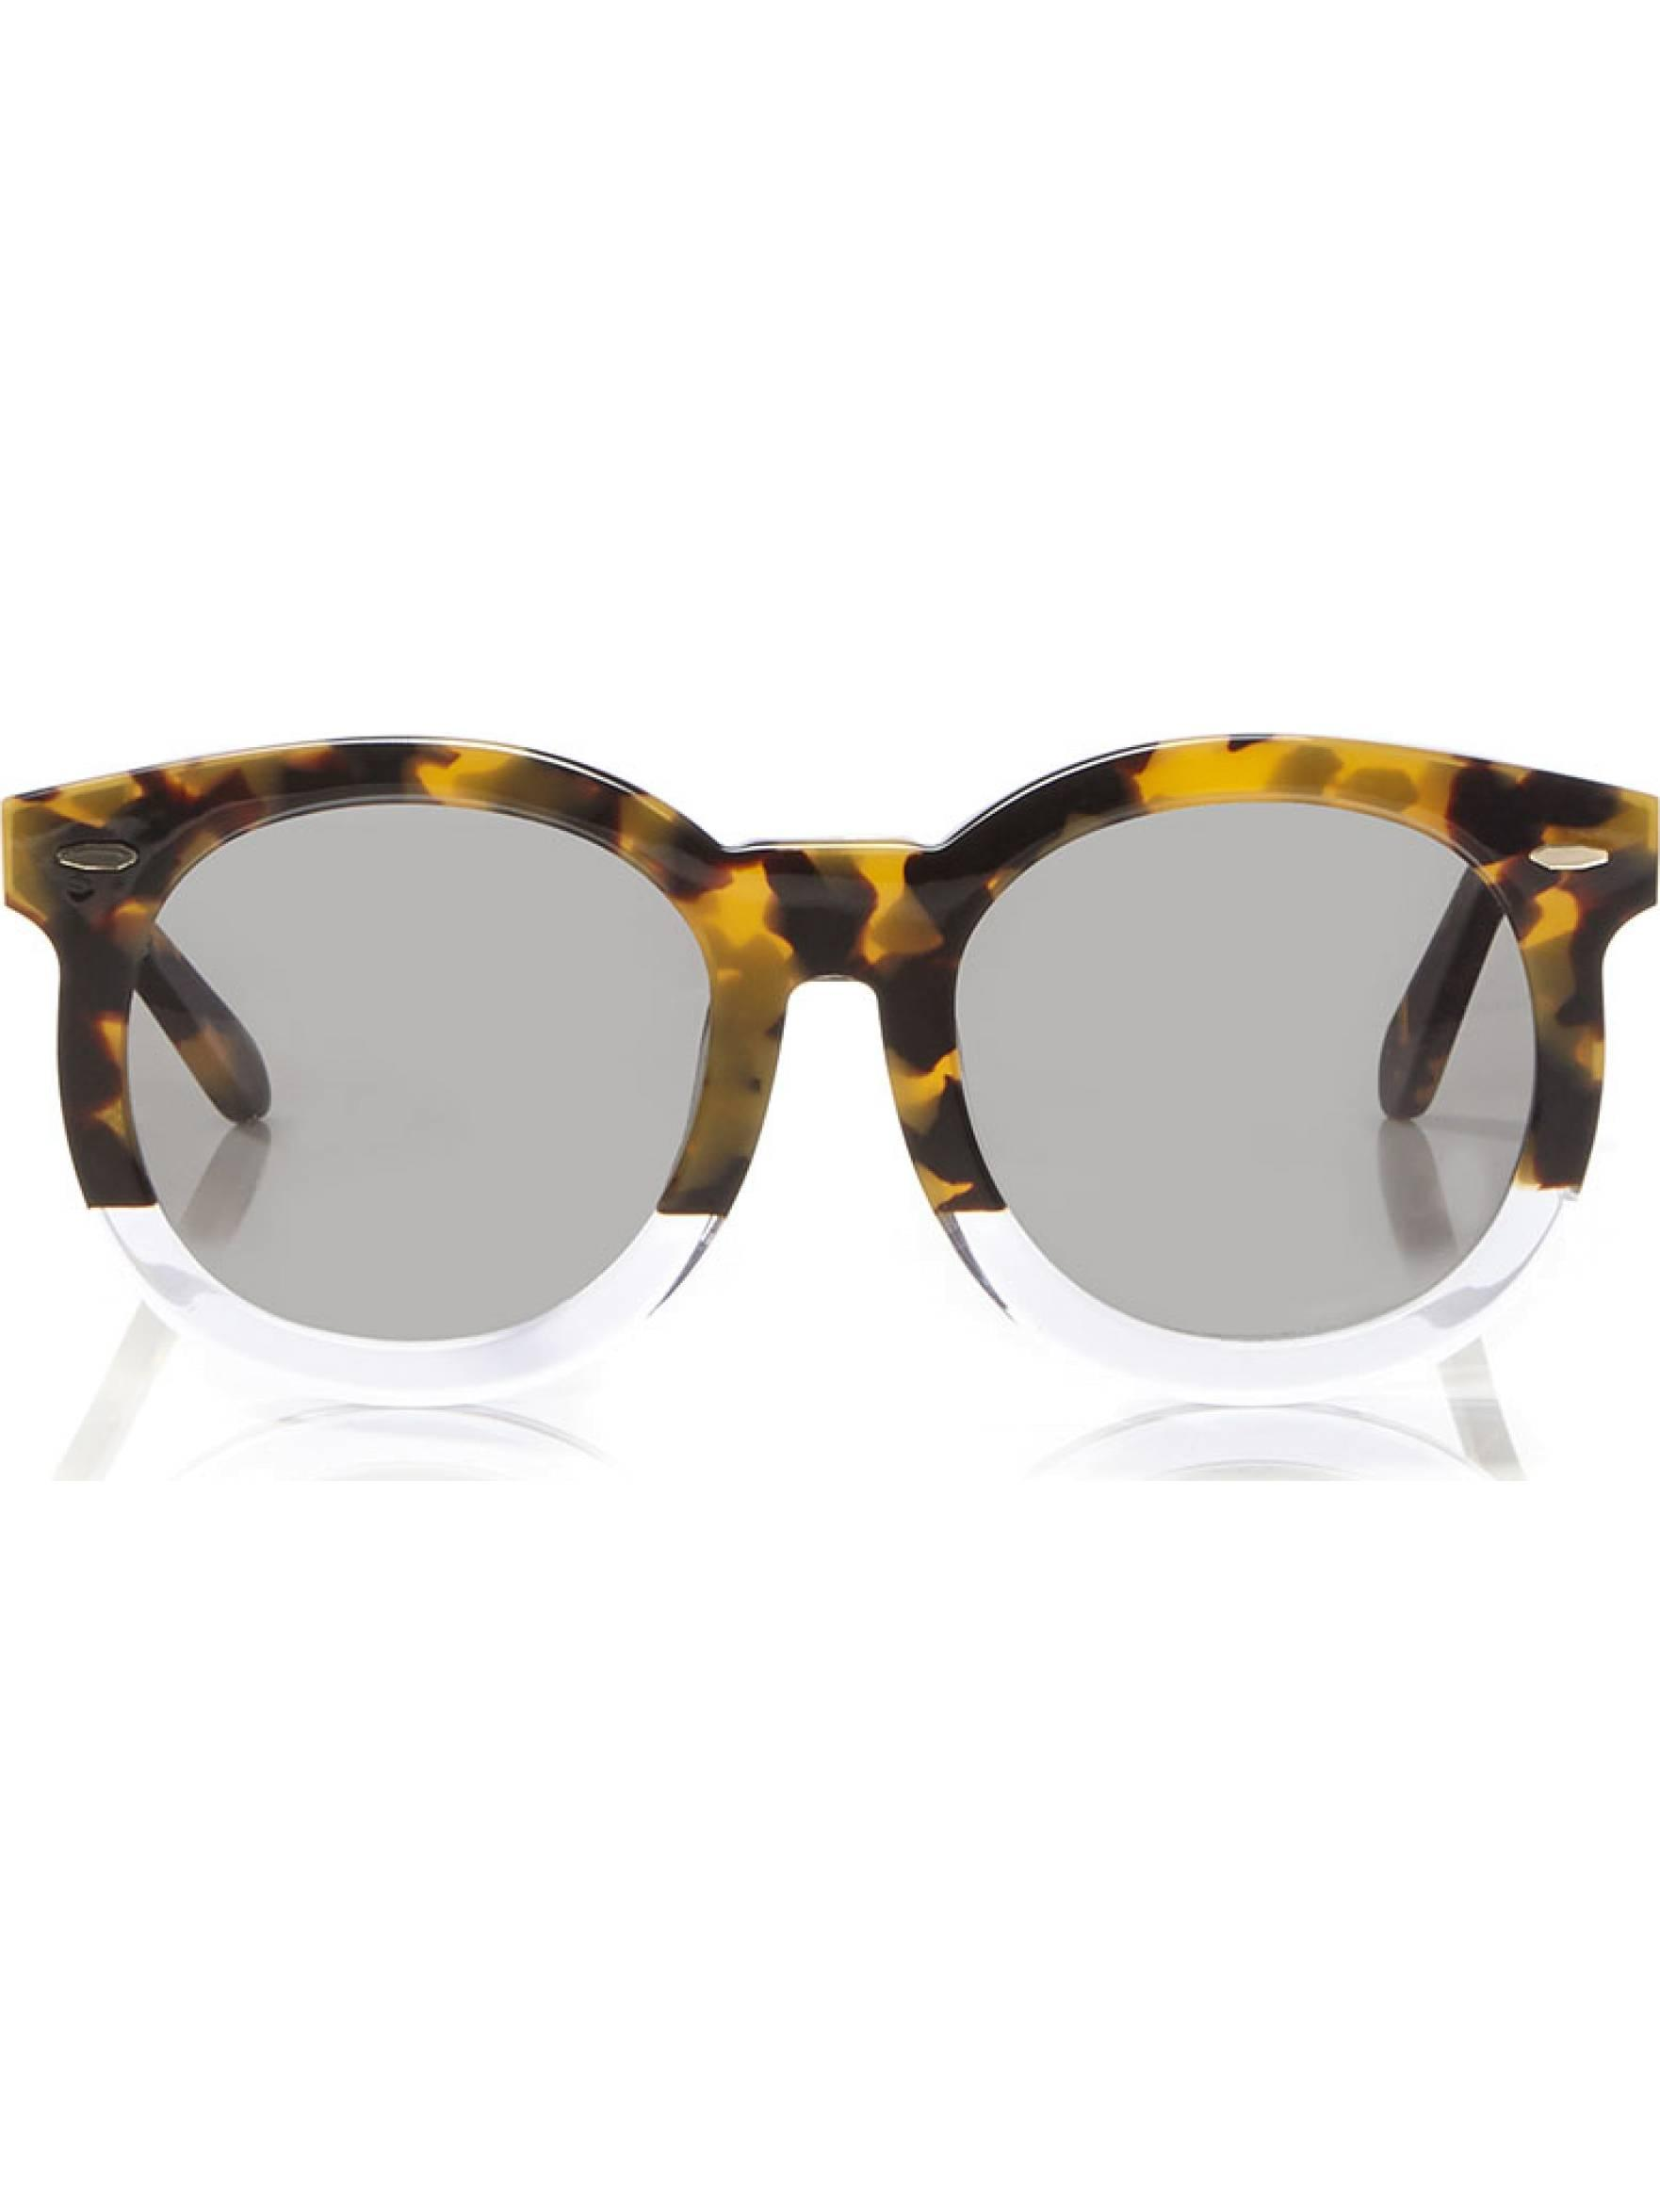 Karen Walker Mirrored Sunglasses  karen walker sunglasses women s sunglasses lyst